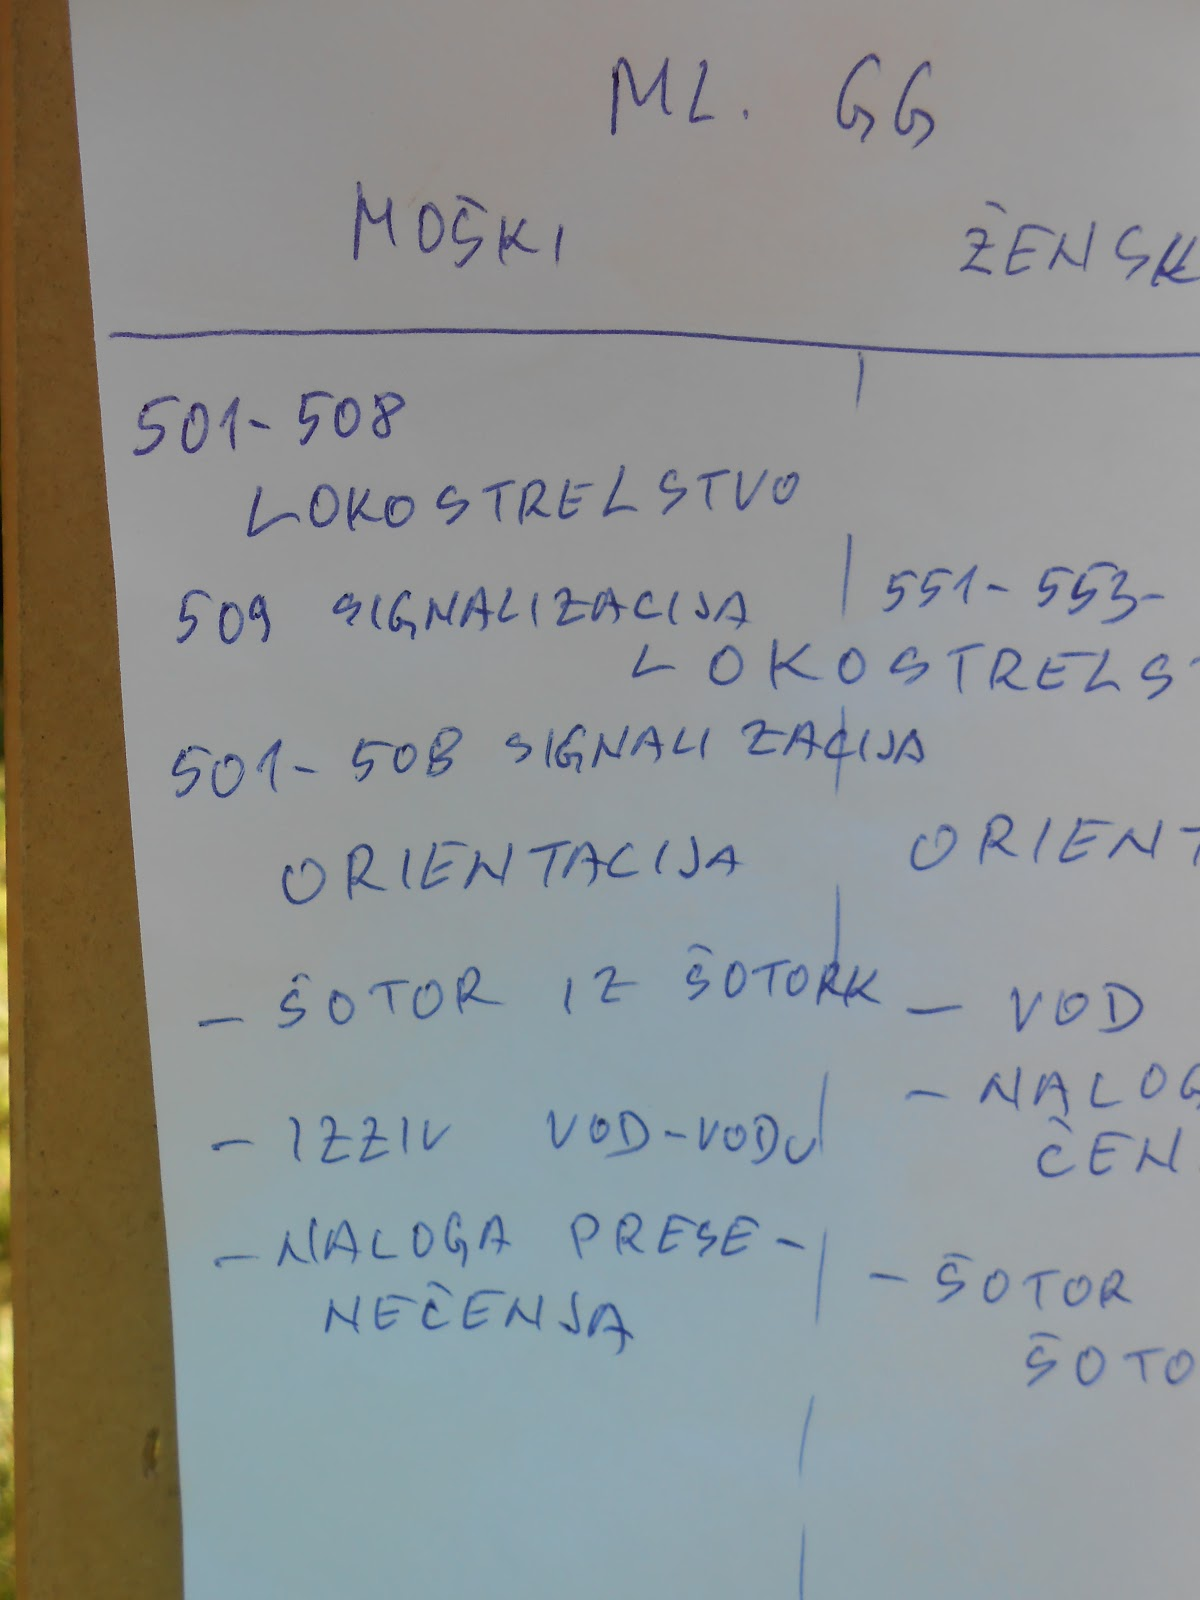 Državni mnogoboj, Mirna 2016 - DSCN5413.JPG